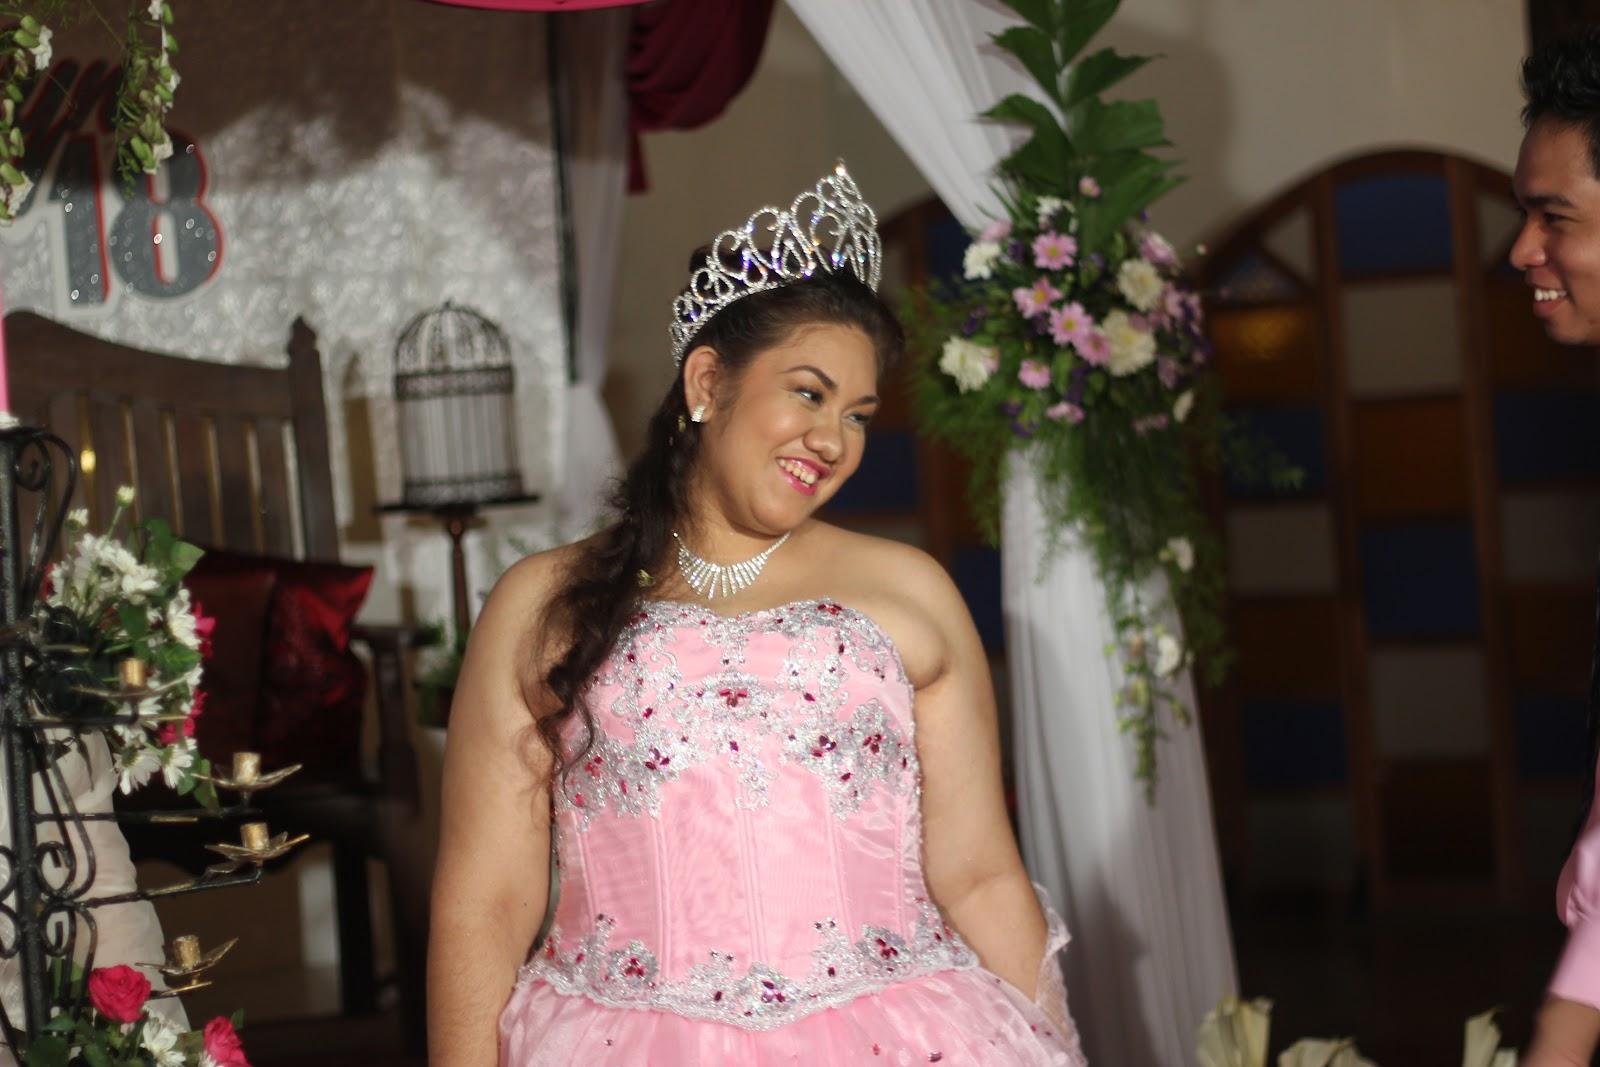 Memories | My 18th Debutant Ball | Fashion Fairytale | A Tale of ...